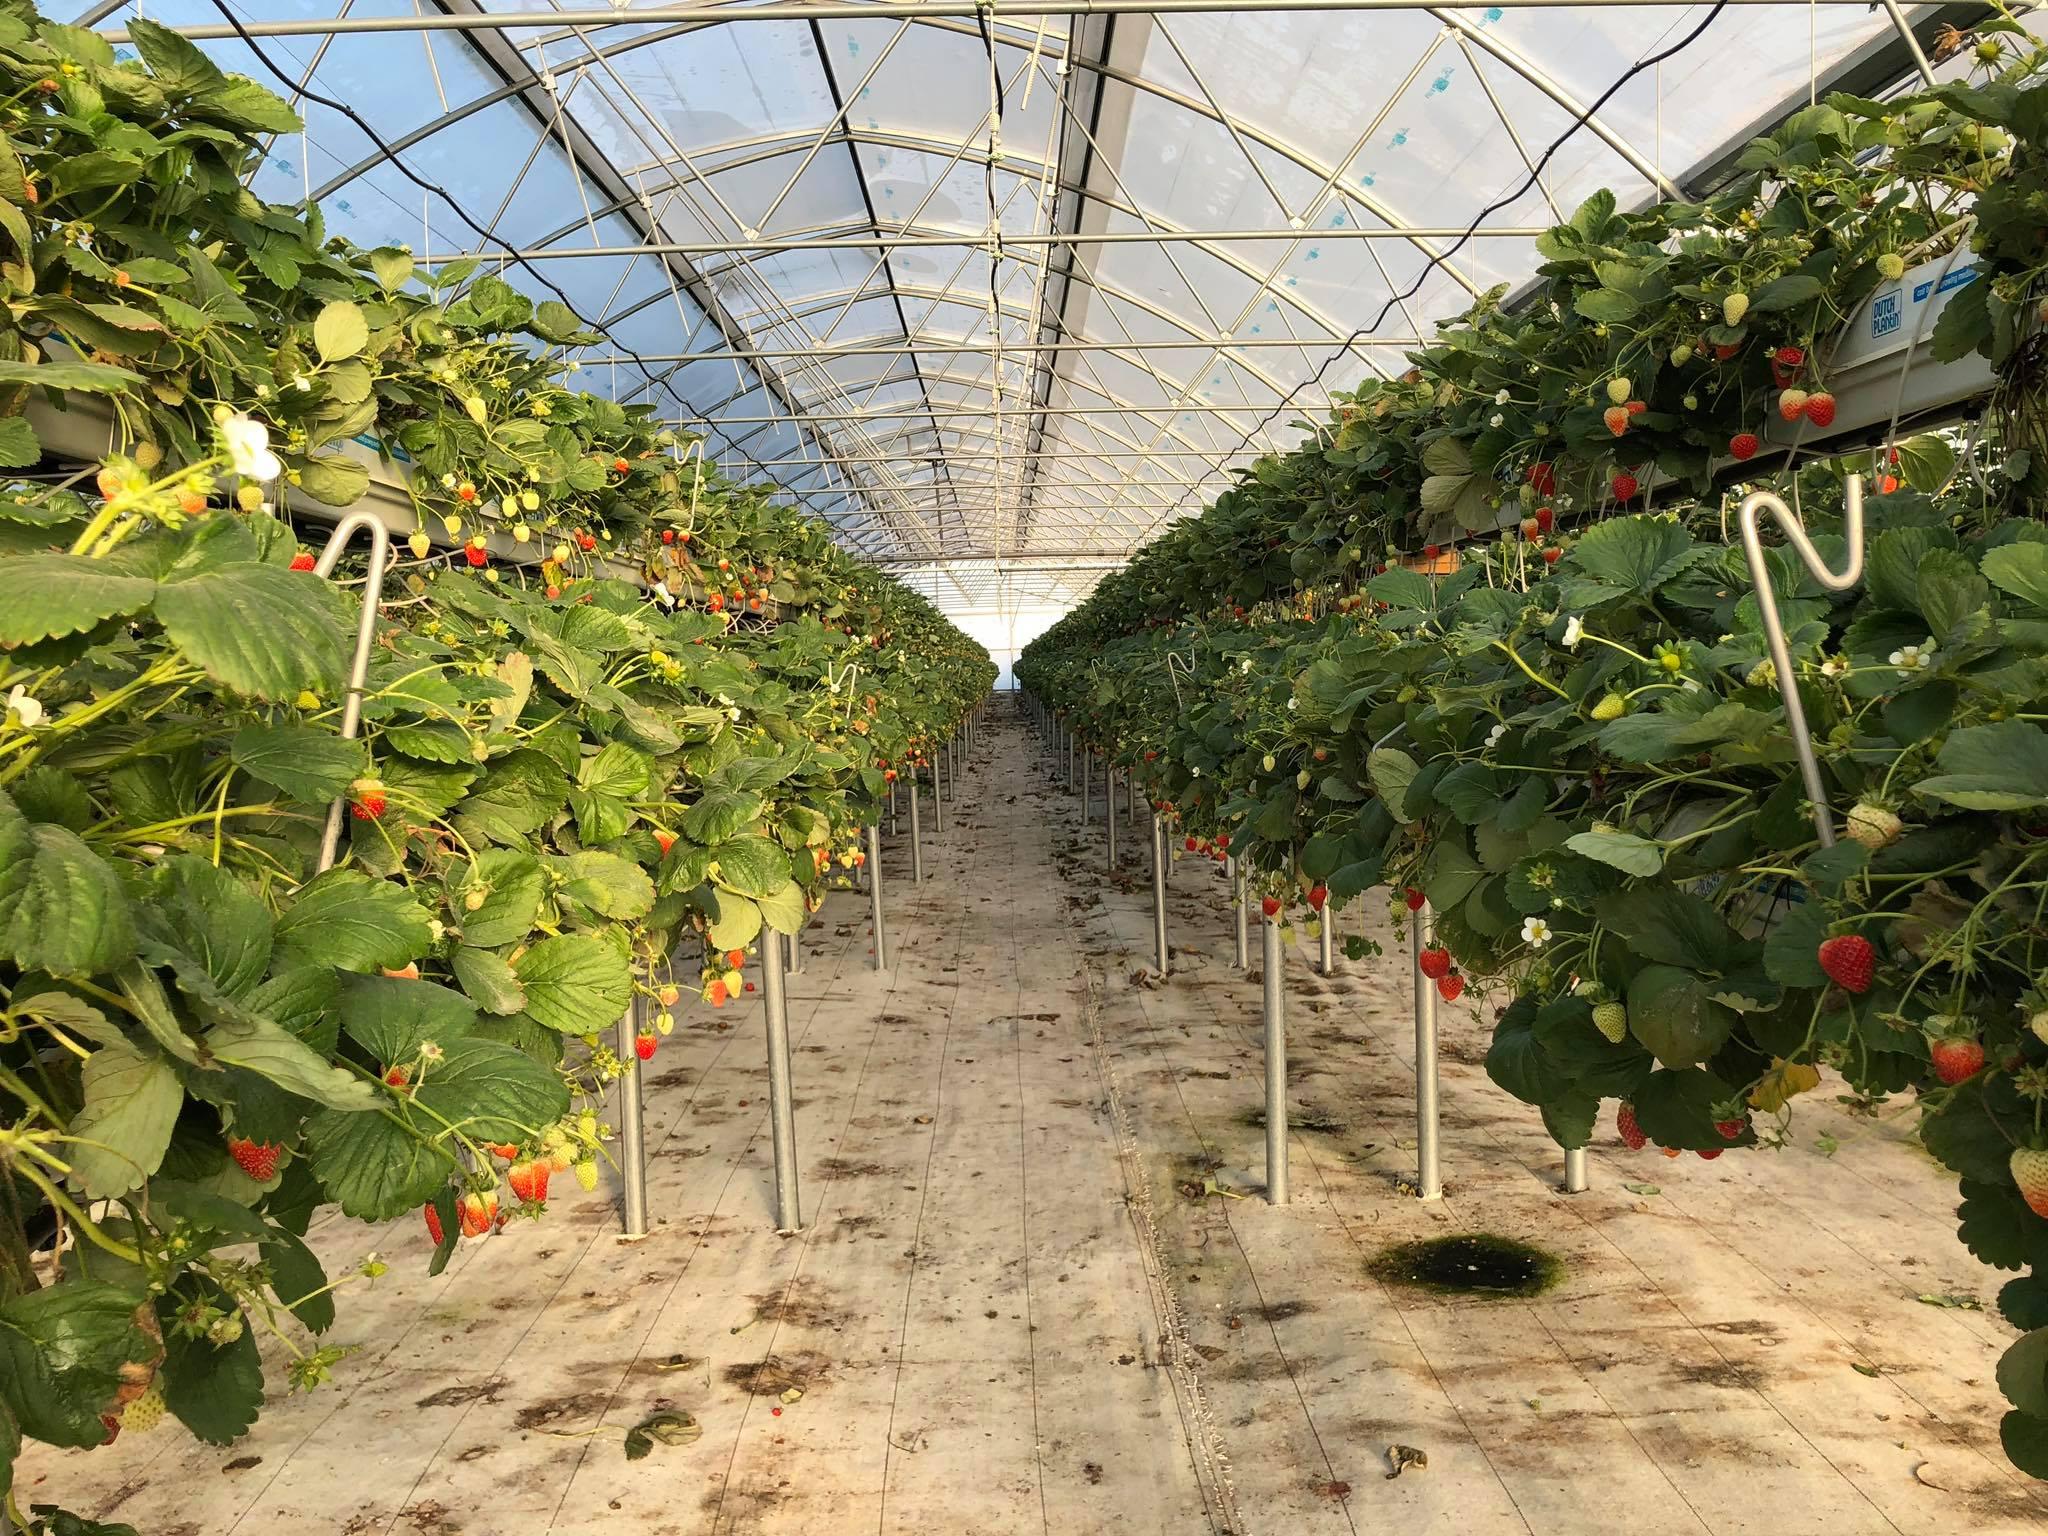 AFIR: 60 ha de sere, solarii si ciupercarii finantate din bani europeni (sM 4.1)